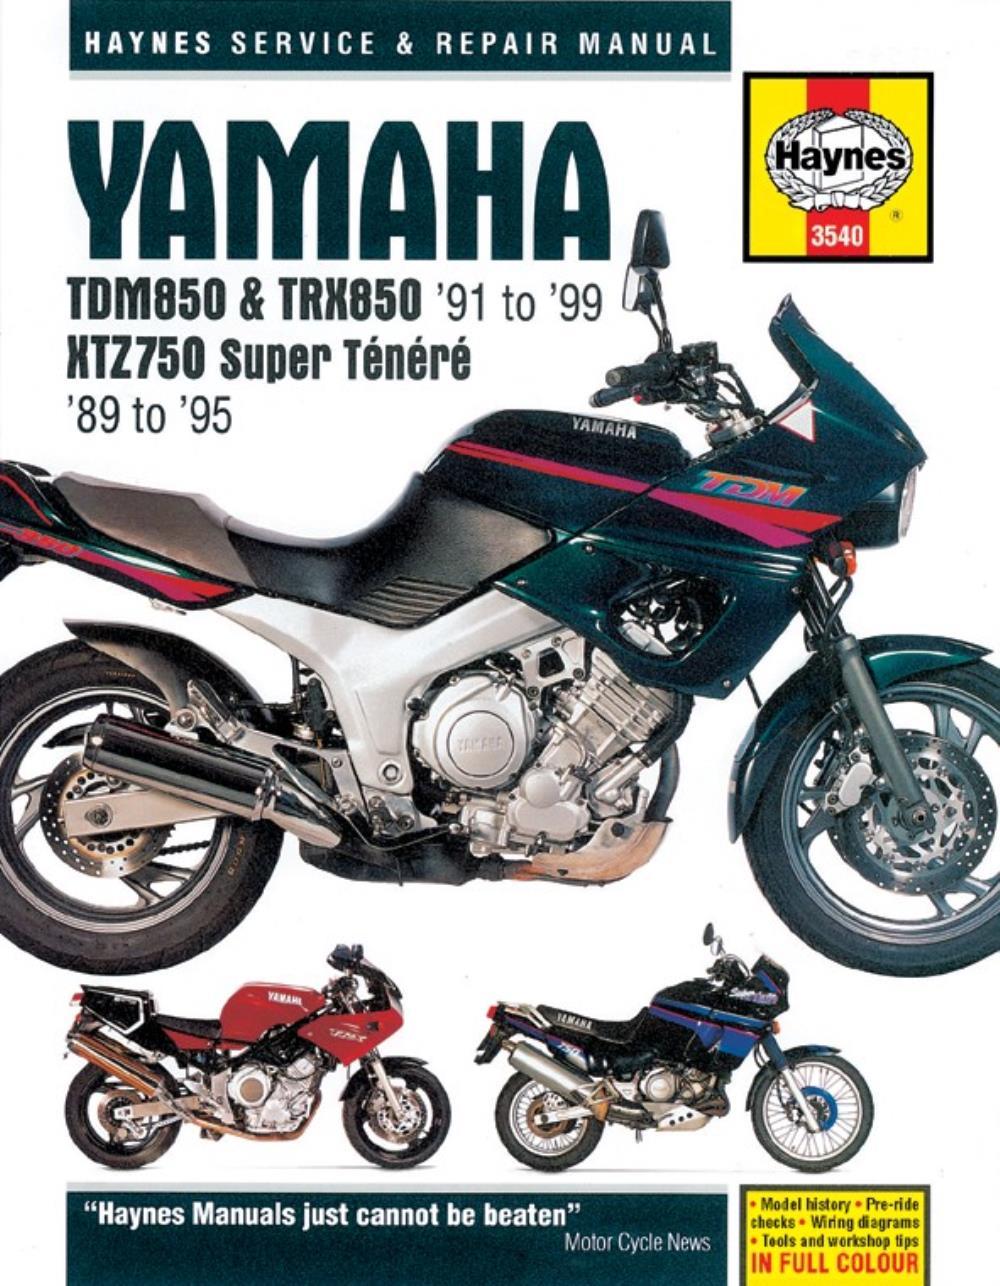 manual haynes for 2001 yamaha tdm 850 mark 2 4tx8 ebay rh ebay co uk New Yamaha Xmax Scooters Motorcycles Yamaha Scooter Service Manuals